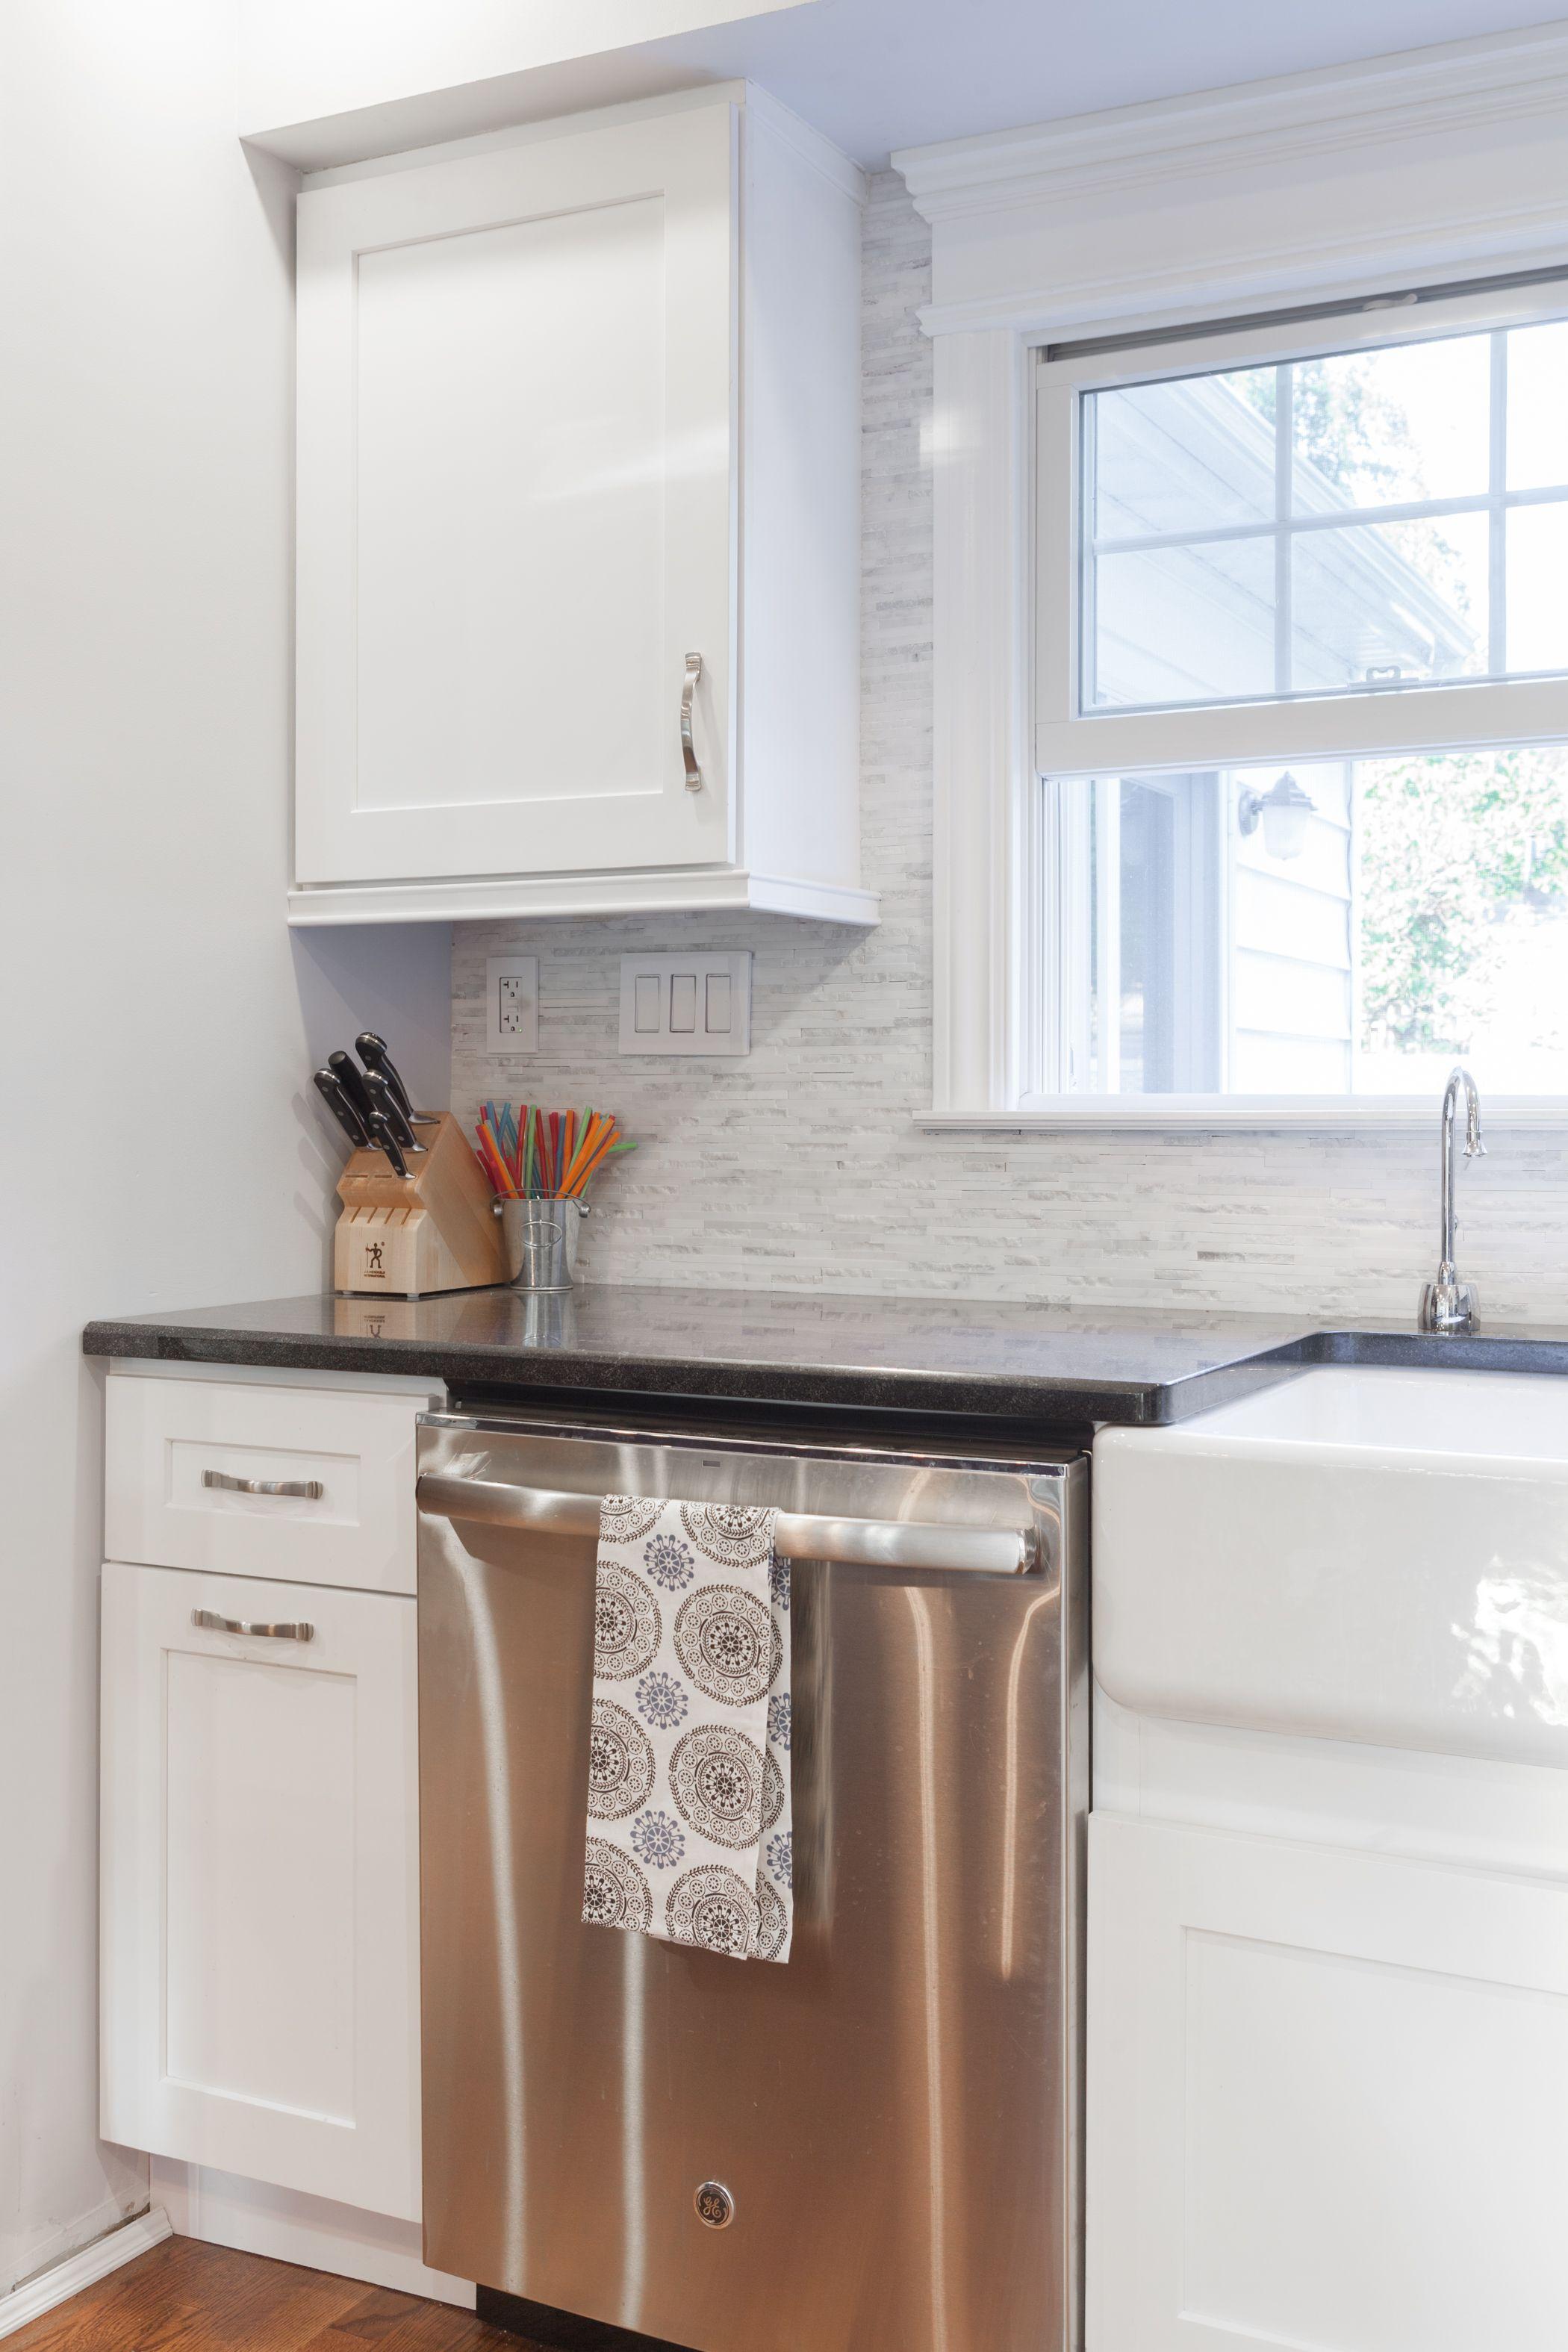 J&K White Maple Cabinets. Style S8 | J&K Modern Cabinets | Pinterest ...